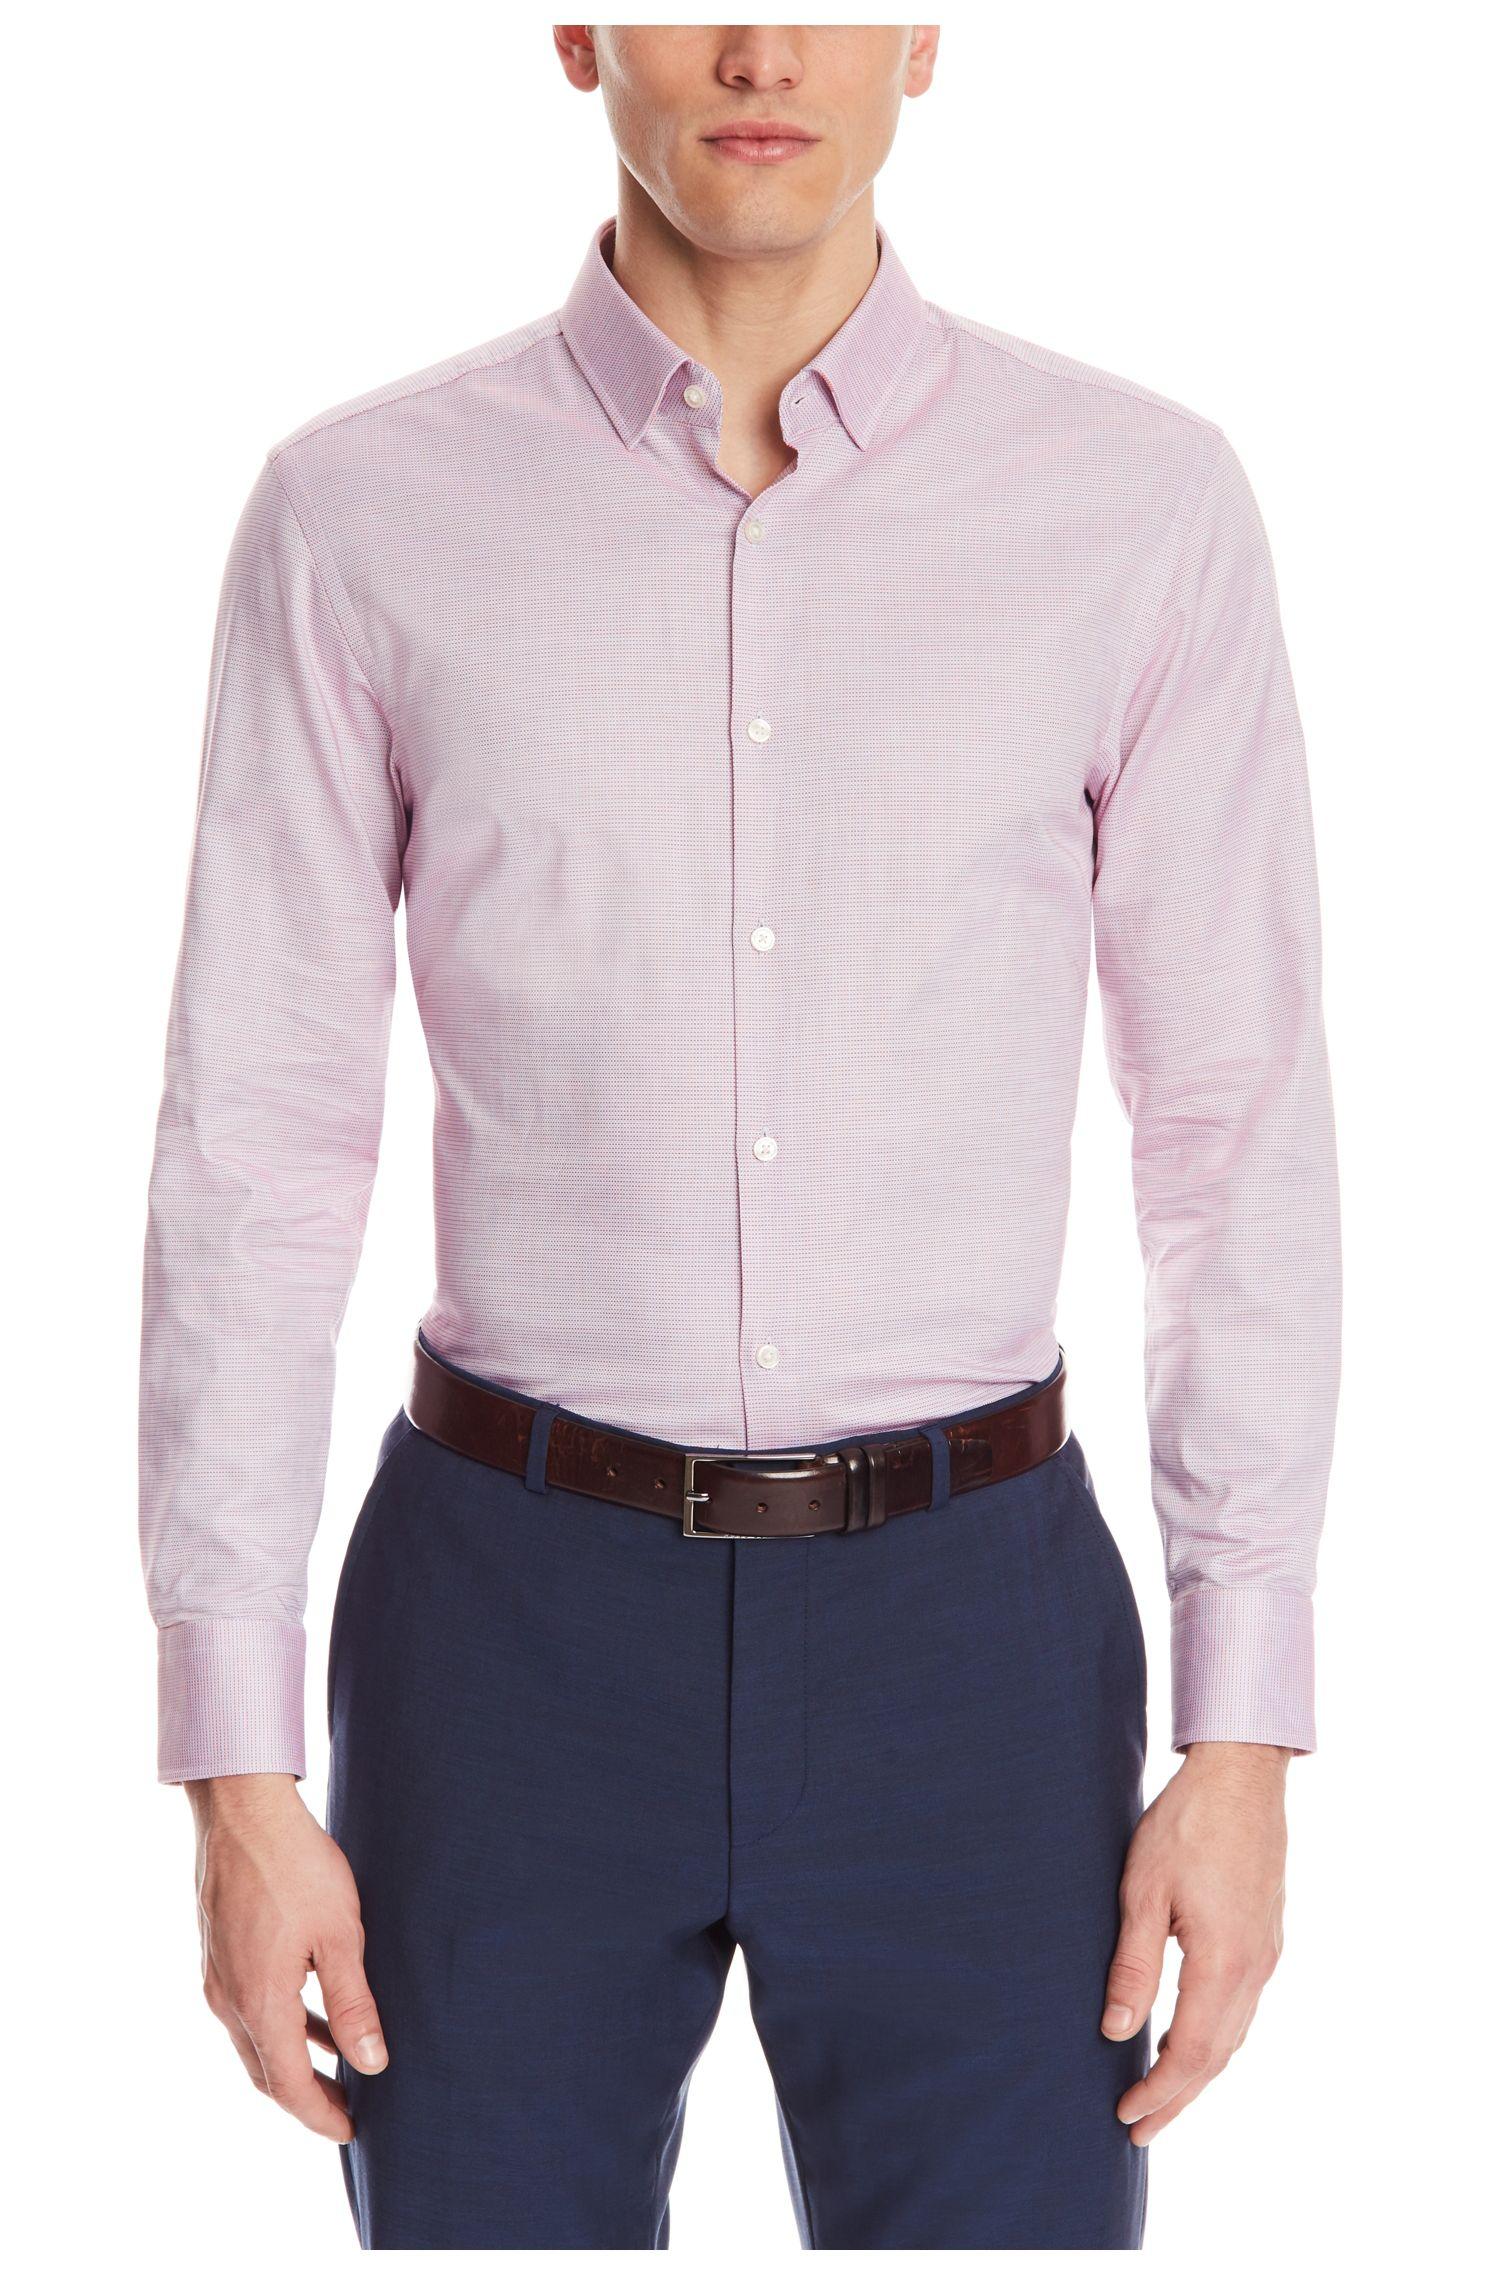 Geometric Cotton Dress Shirt, Sharp Fit | Marley US, Red